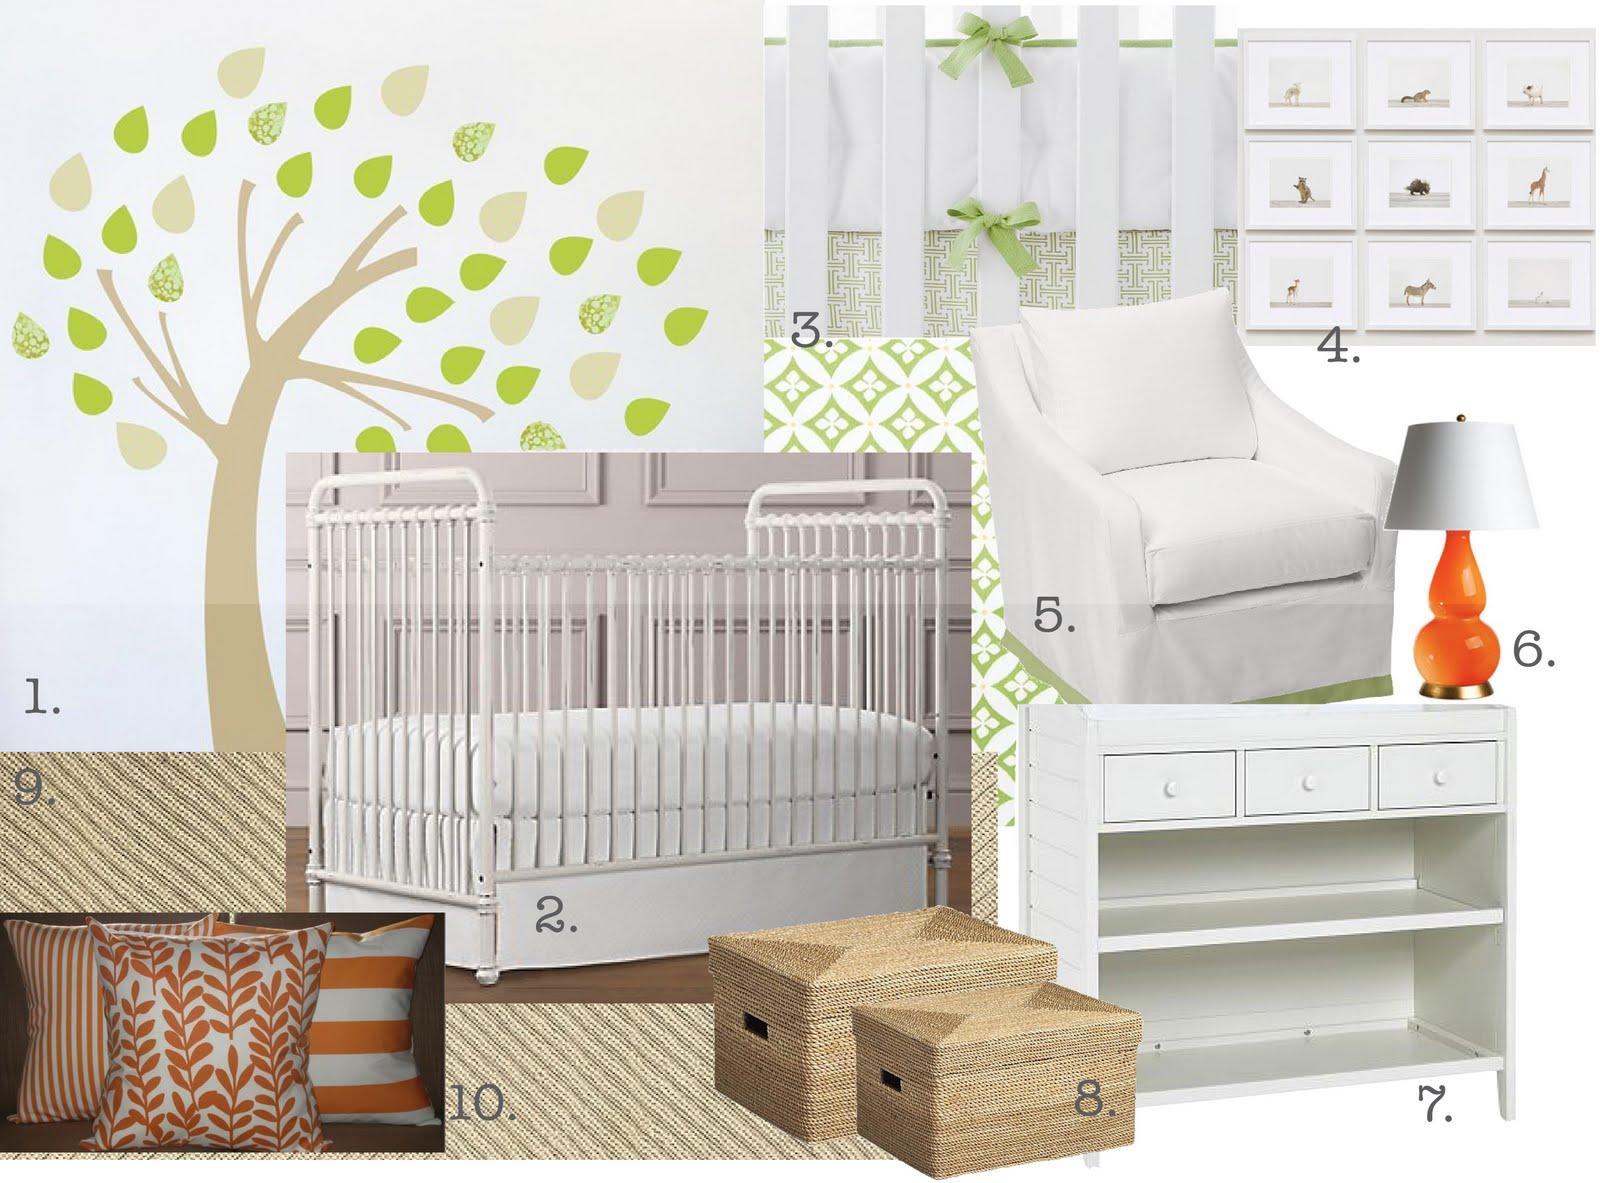 Design studio b neutral baby room design - Baby room designs ...